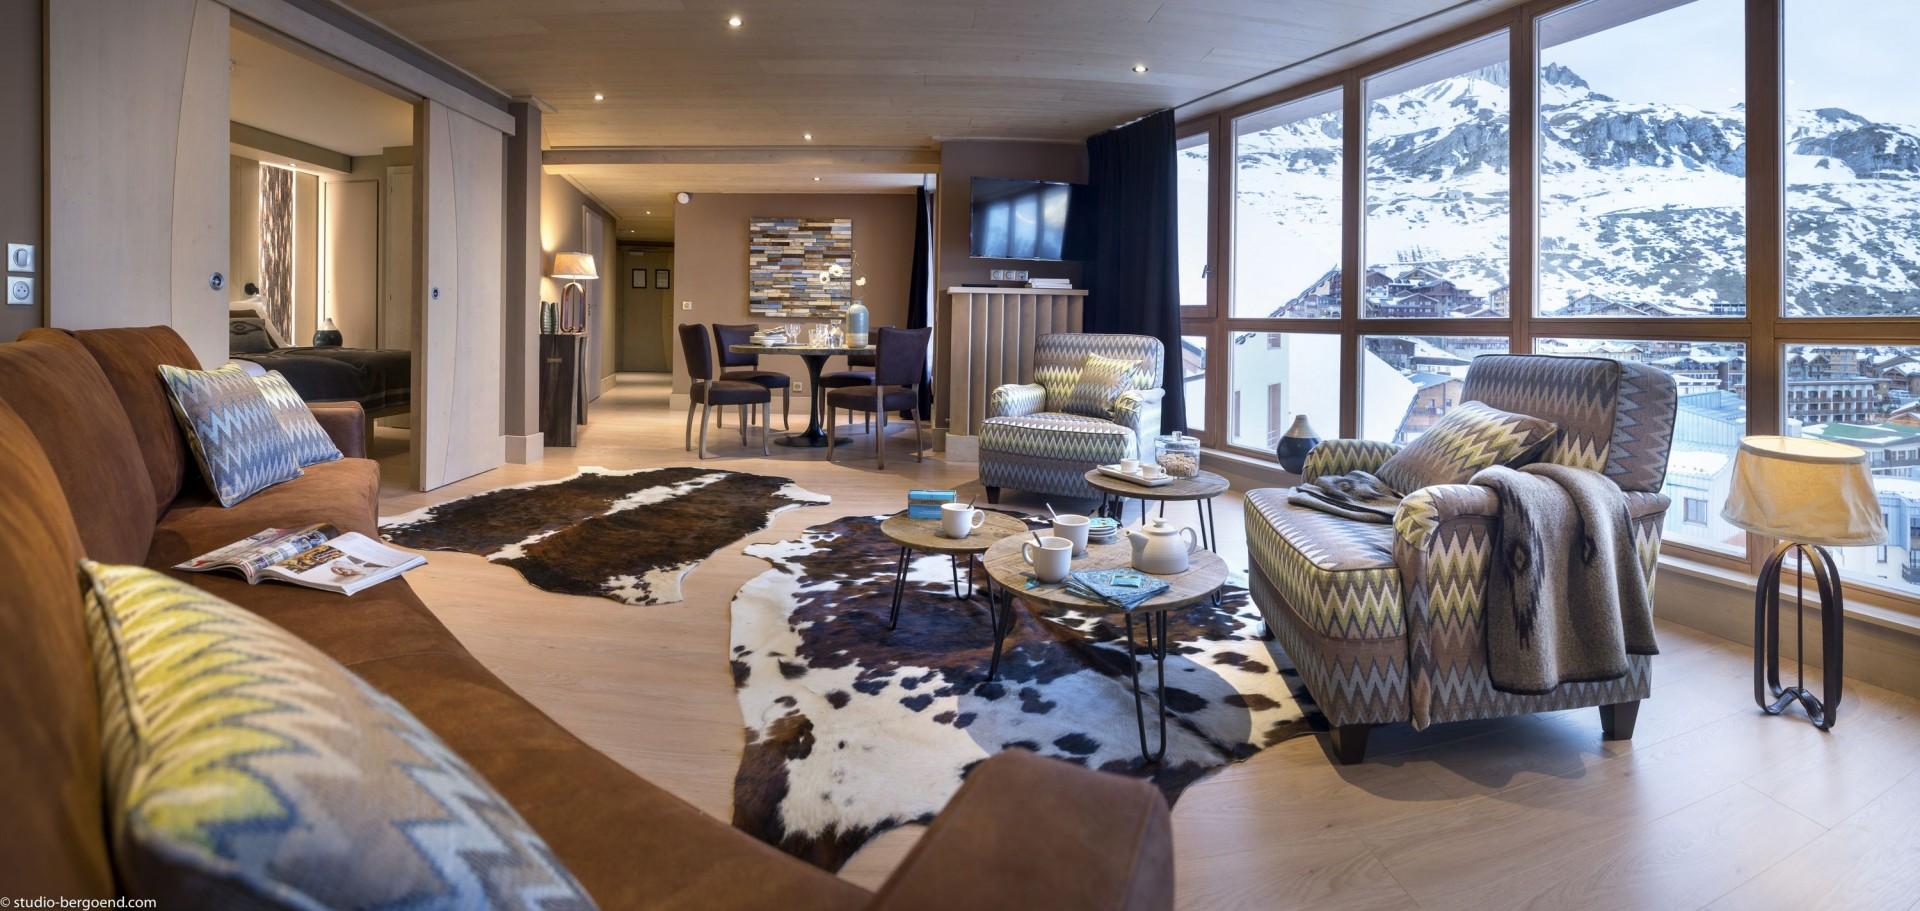 Tignes Location Appartement Luxe Kyaunite Salon